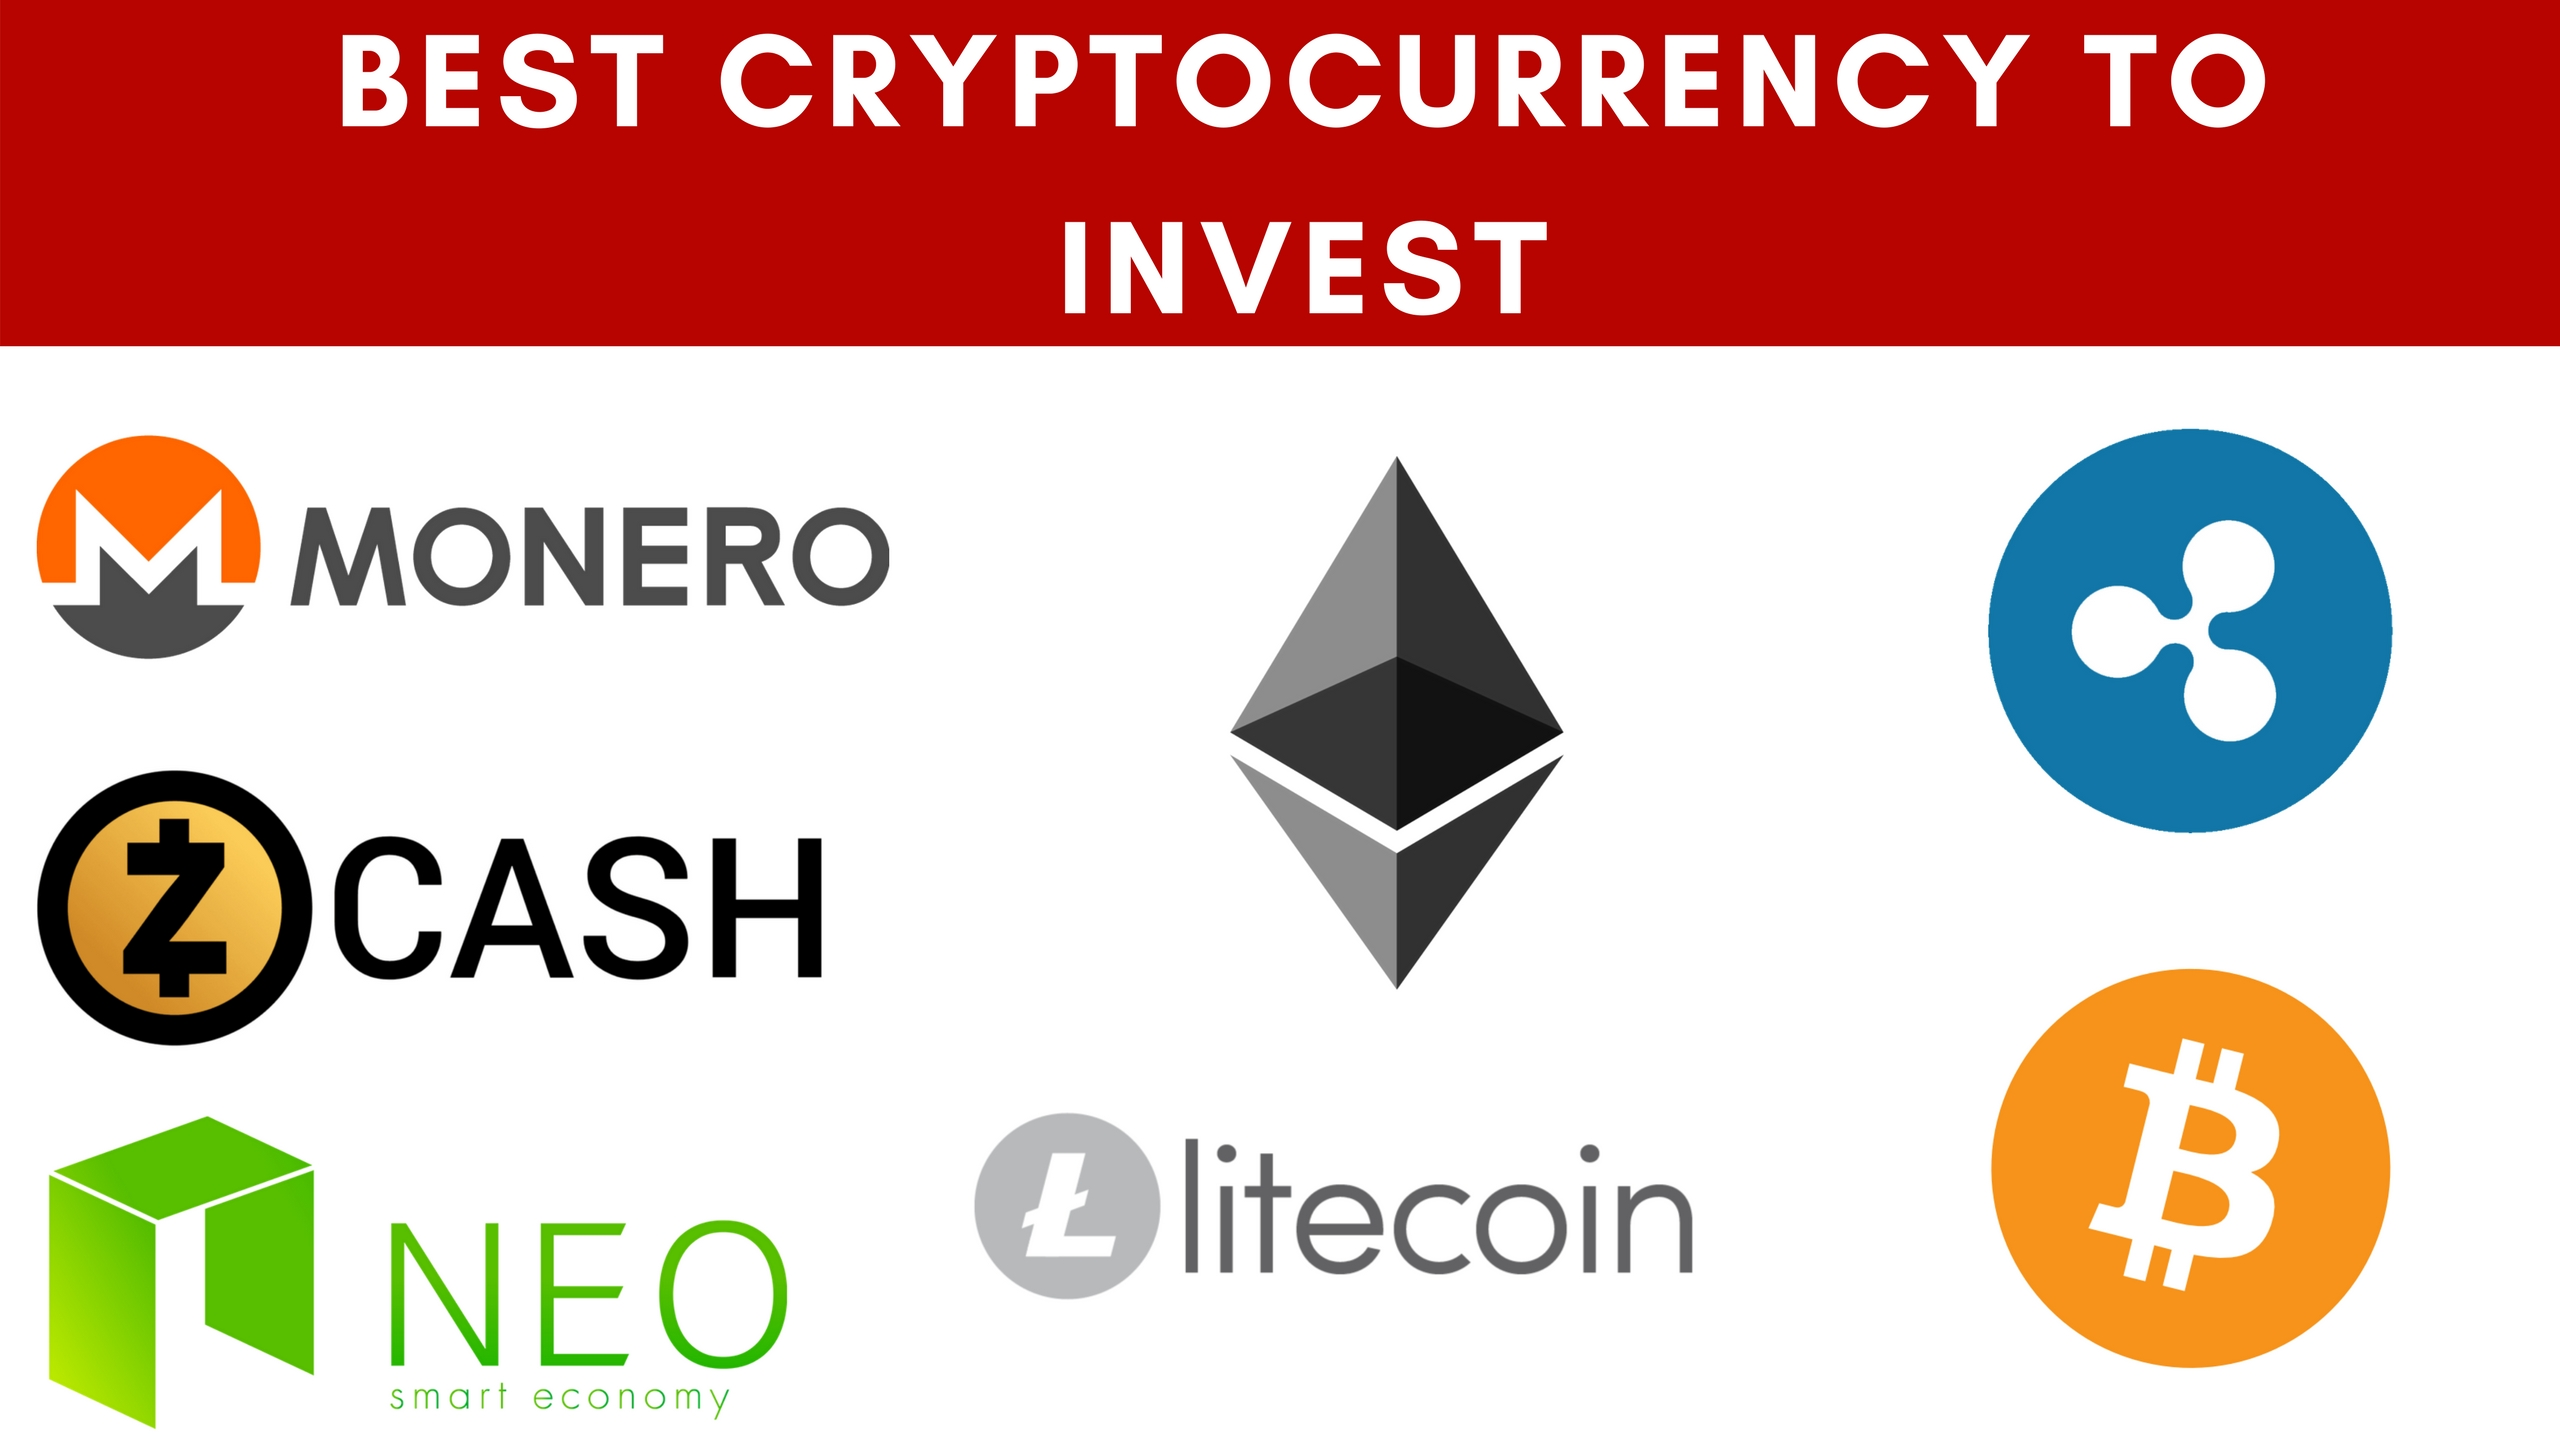 Litecoin Gpu Mining 2018 Cryptocurrencies Help Financial